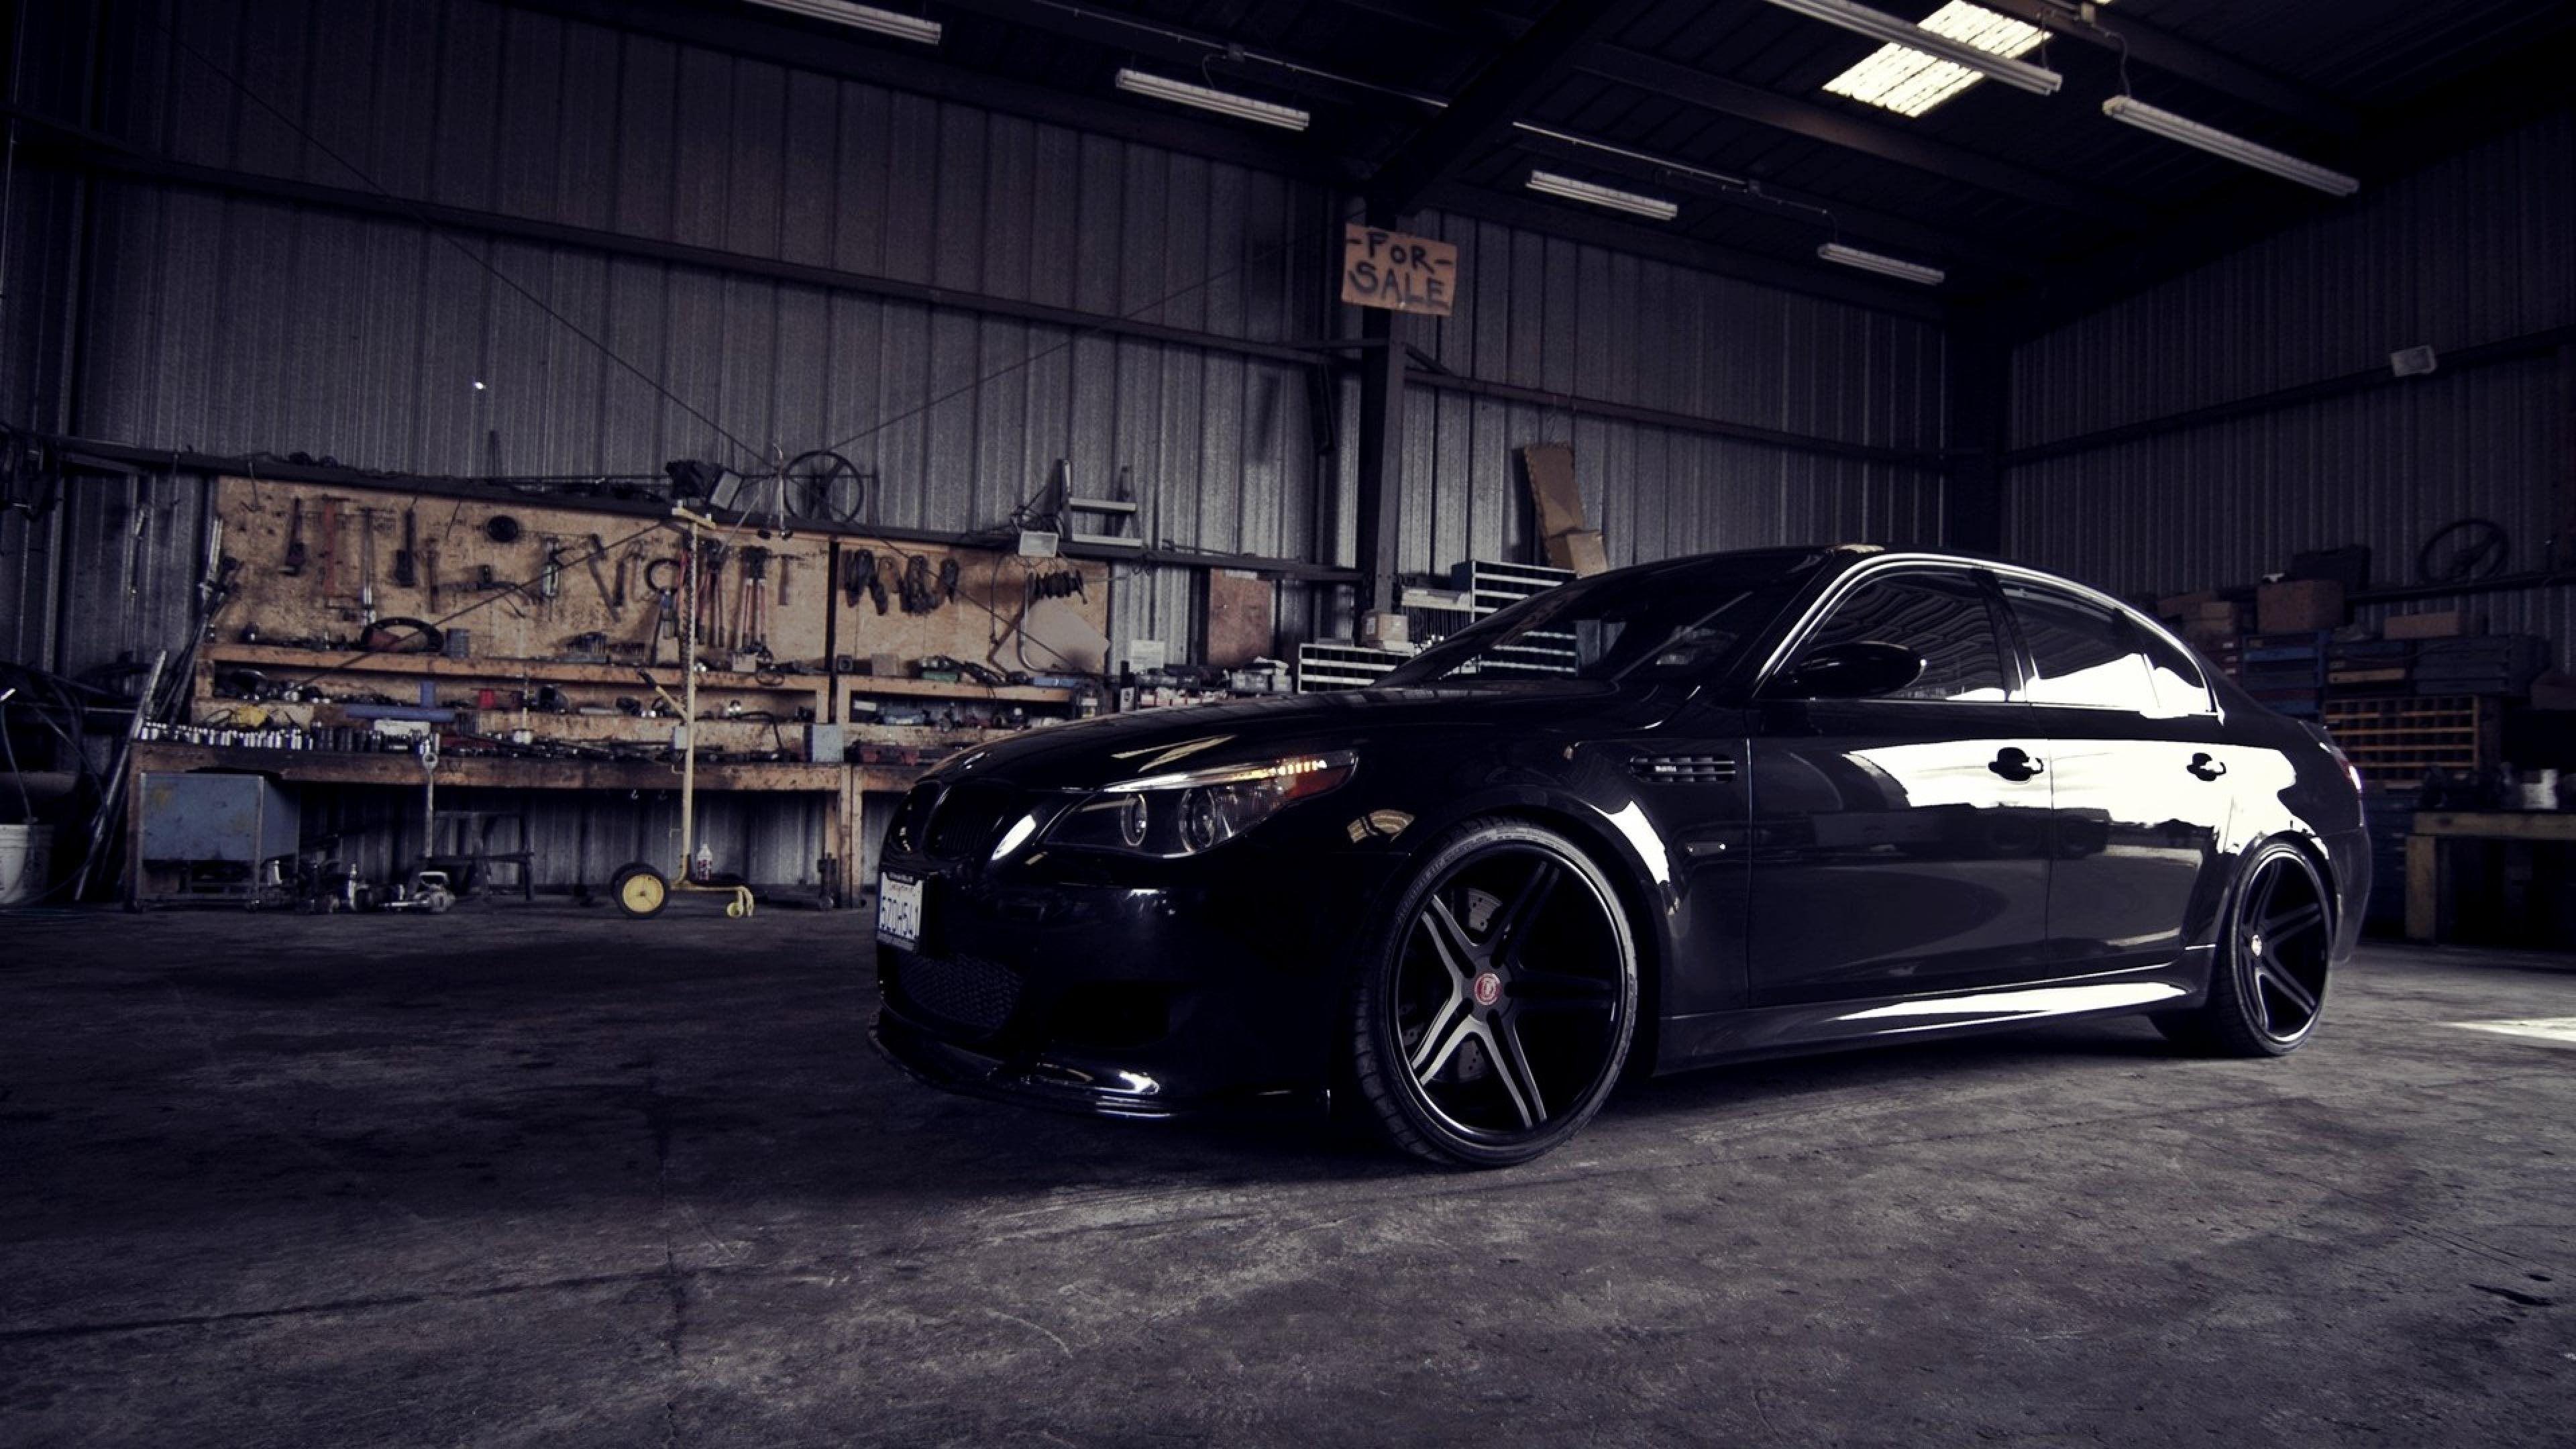 Bmw M5 E60 Garage 4k Ultra Hd Desktop Wallpaper 4k Cars Wallpapers